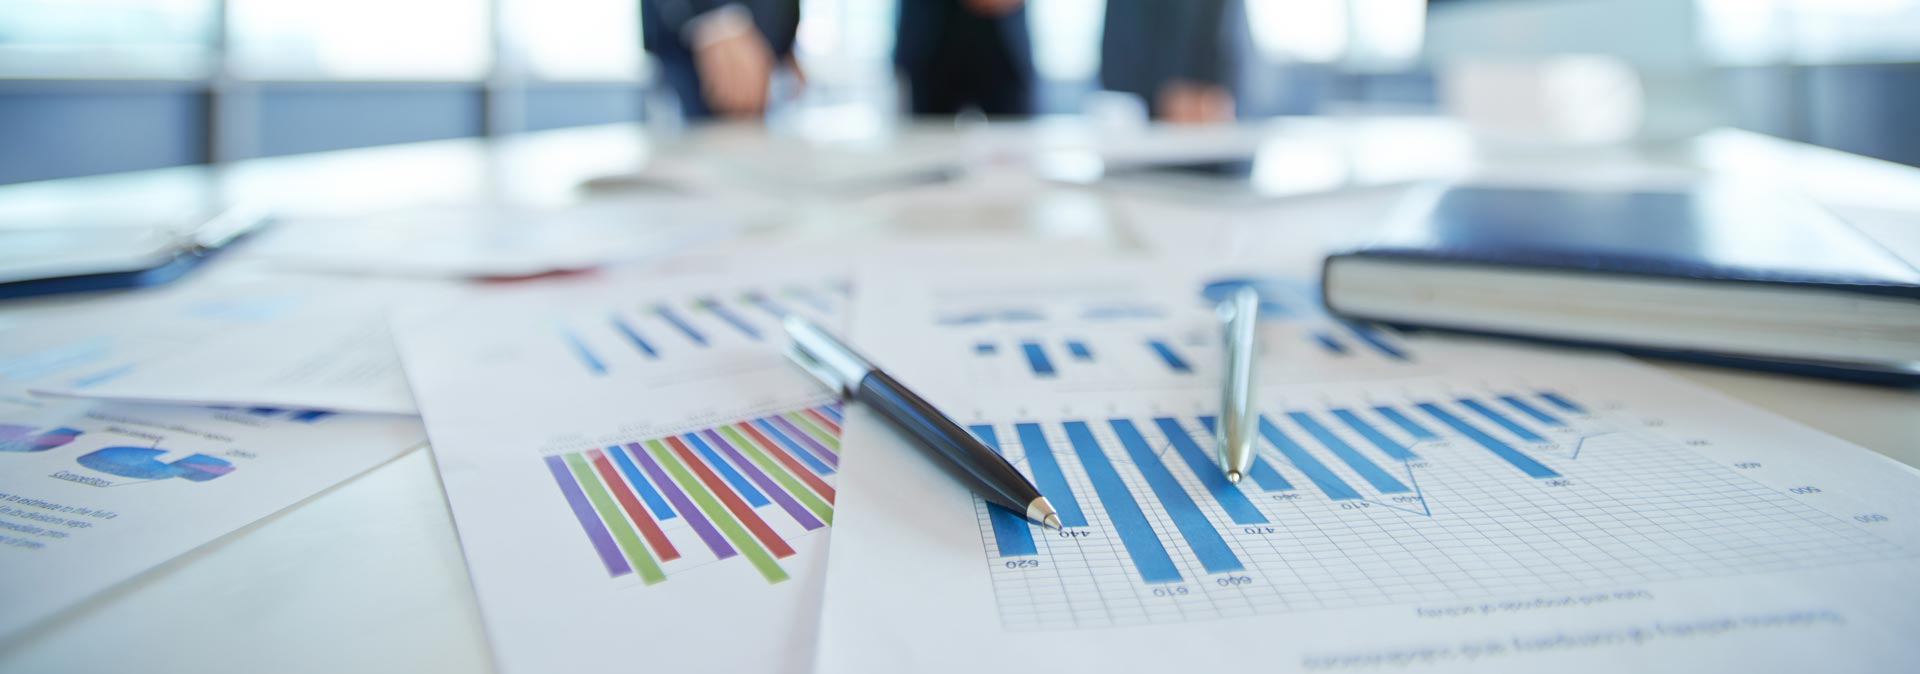 IT-Infrastrukturanalyse